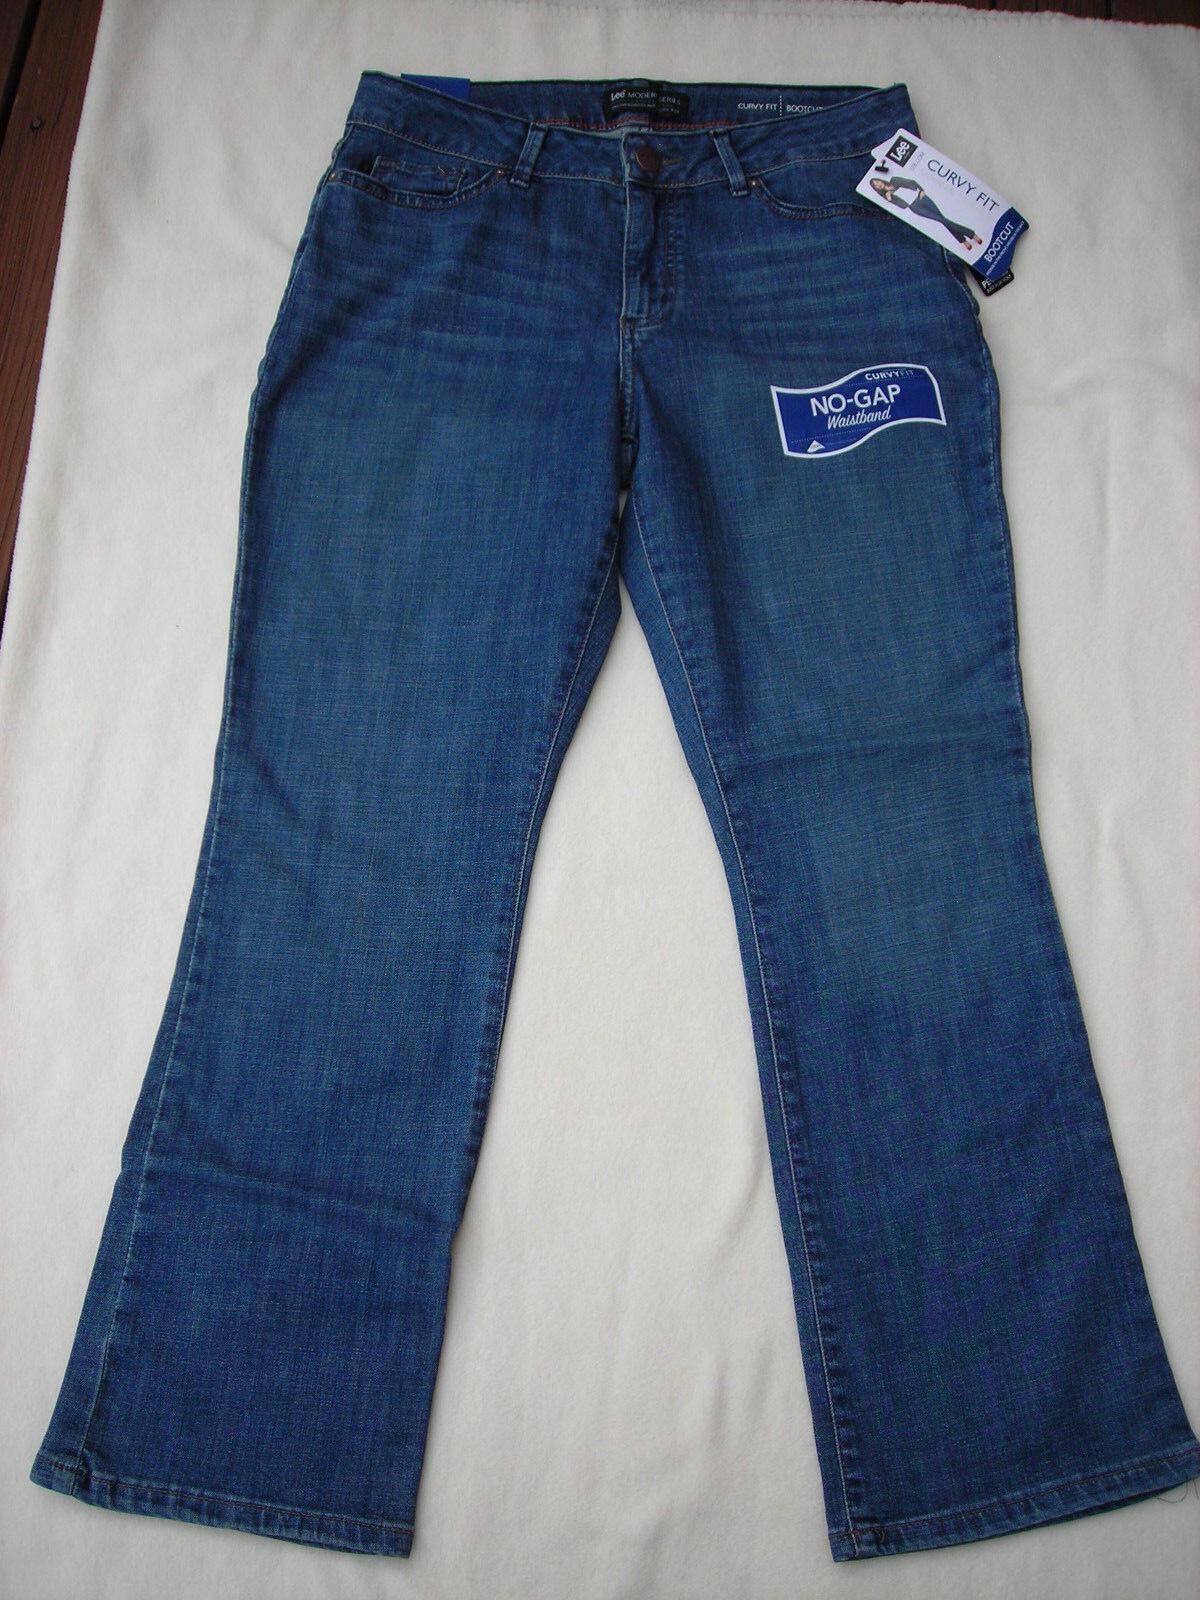 Lee curvy fit bootcut jeans petite